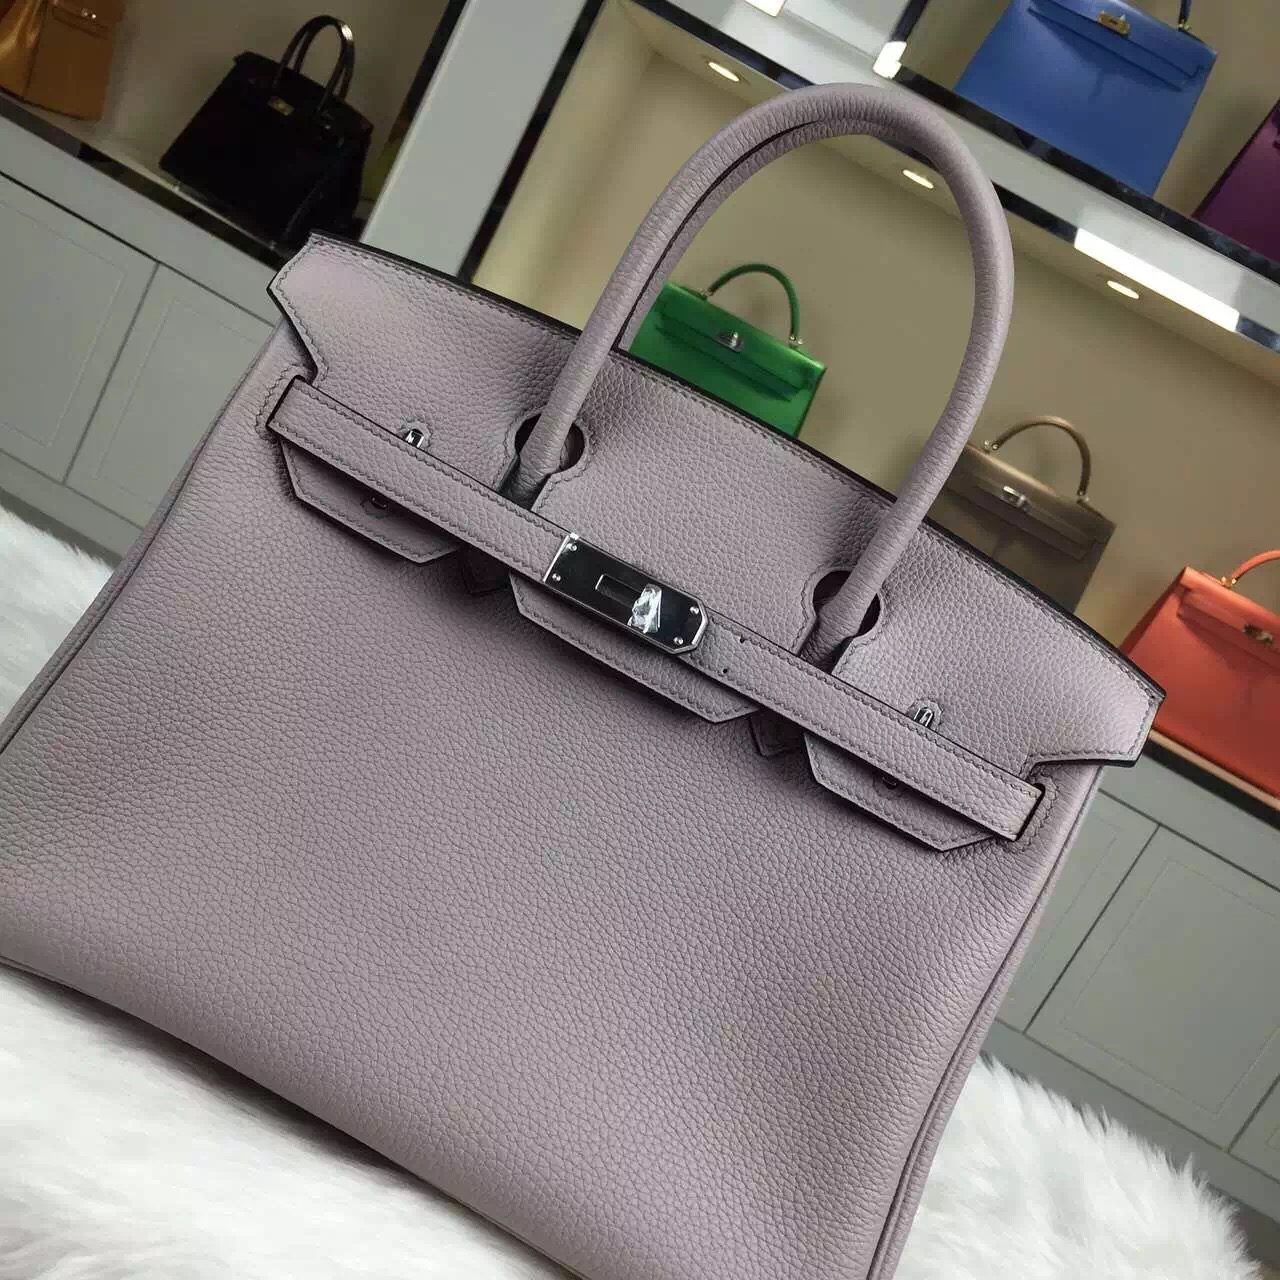 Hand Stitching Hermes Grey Blue Togo Leather Birkin Bag 30cm Women's Tote Bag